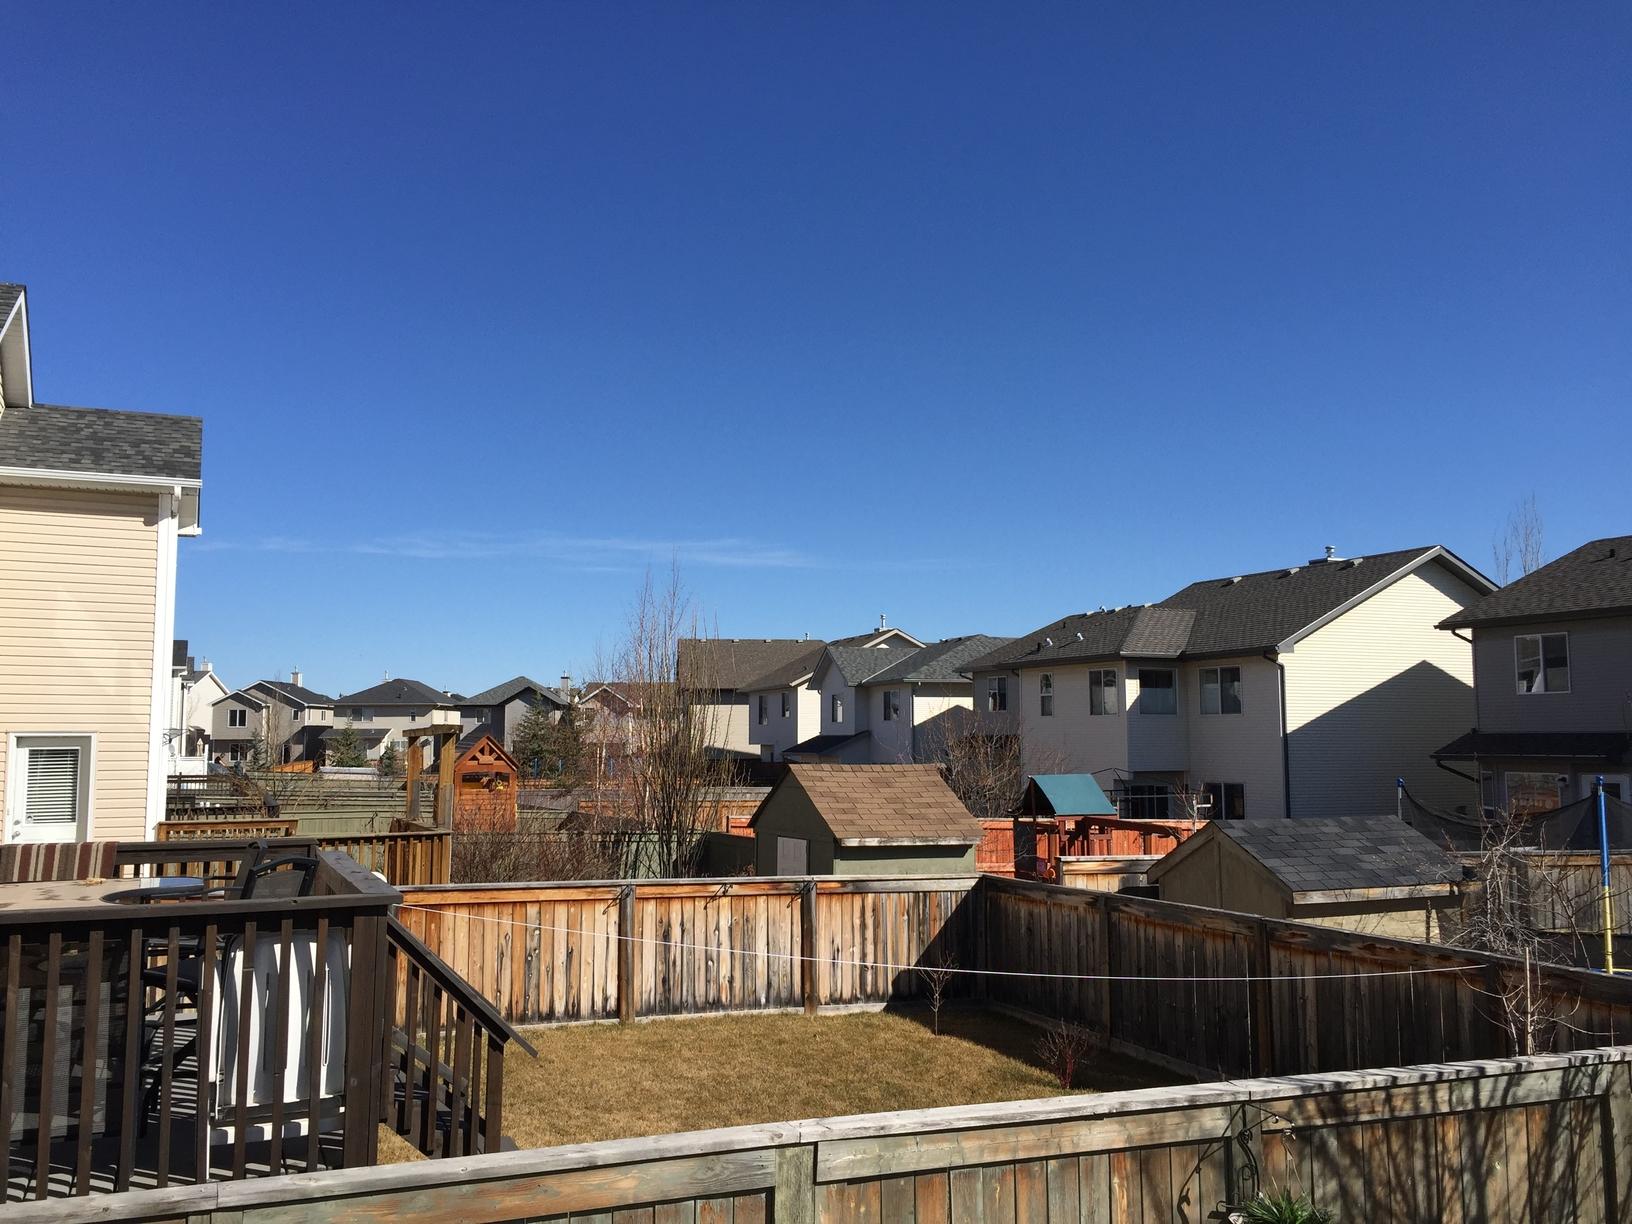 Growing tips for gardening in Calgary